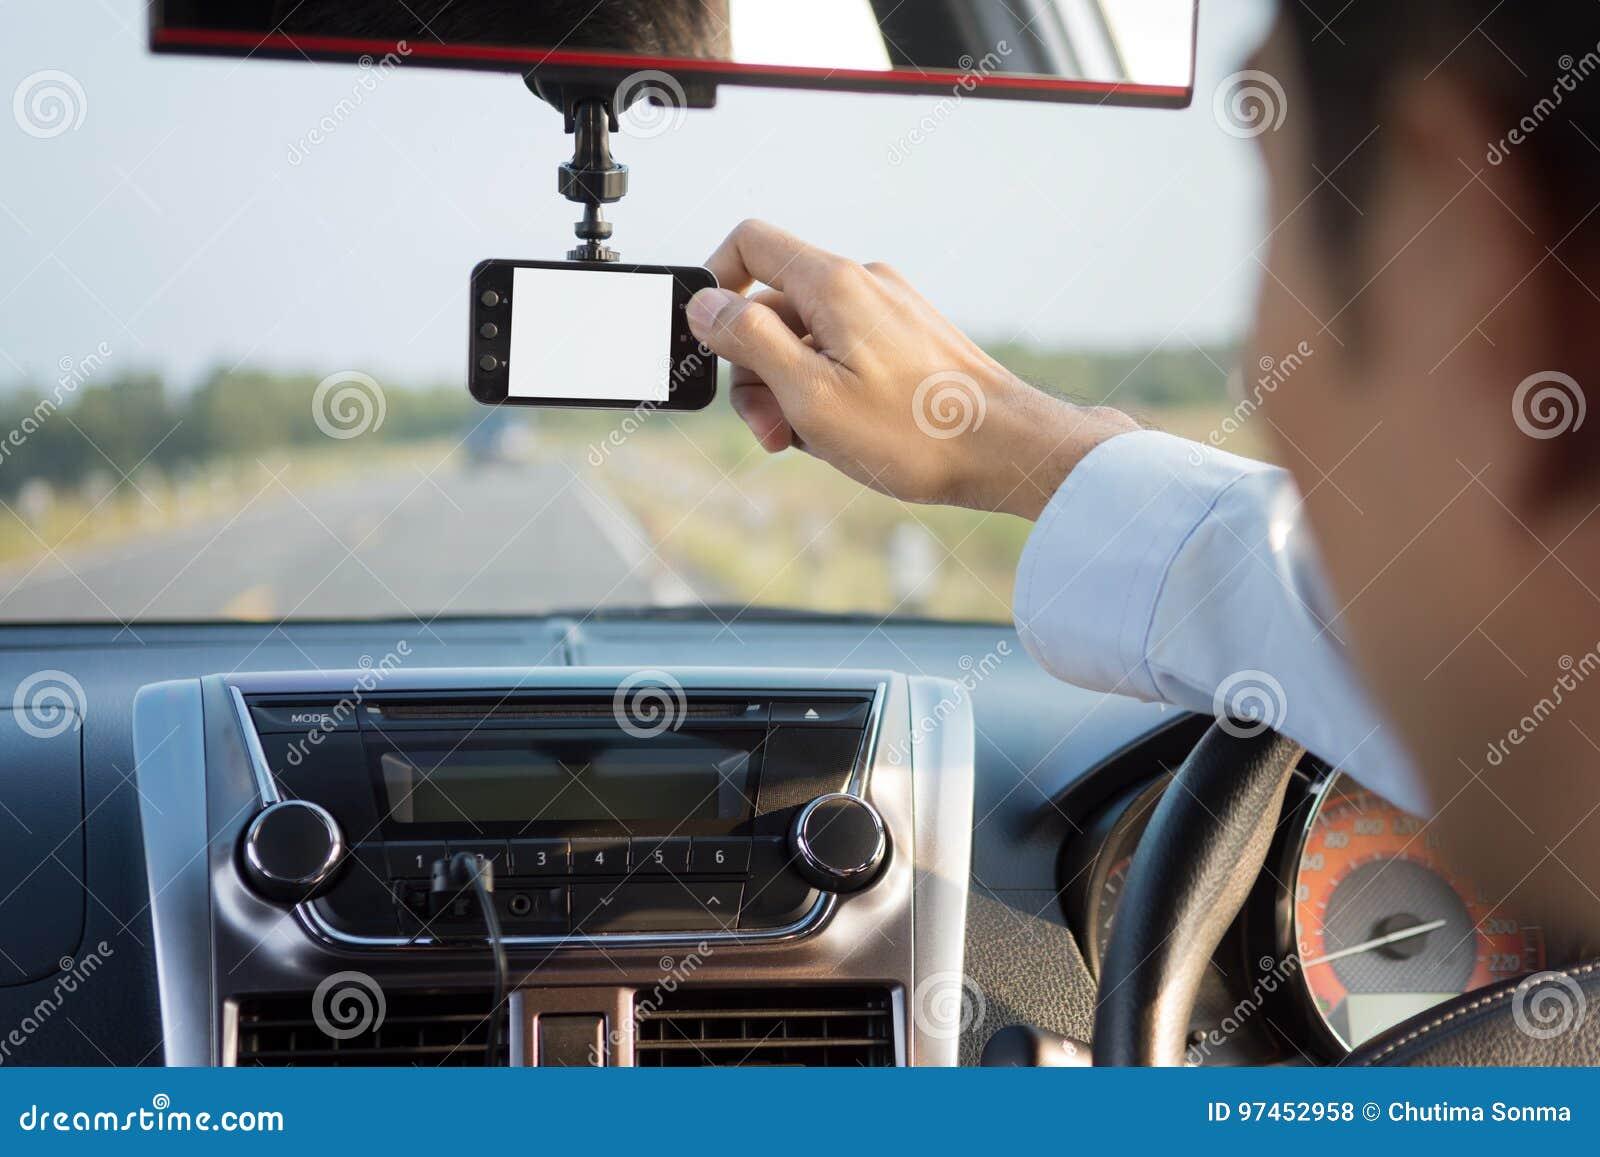 Video recorder driving a car